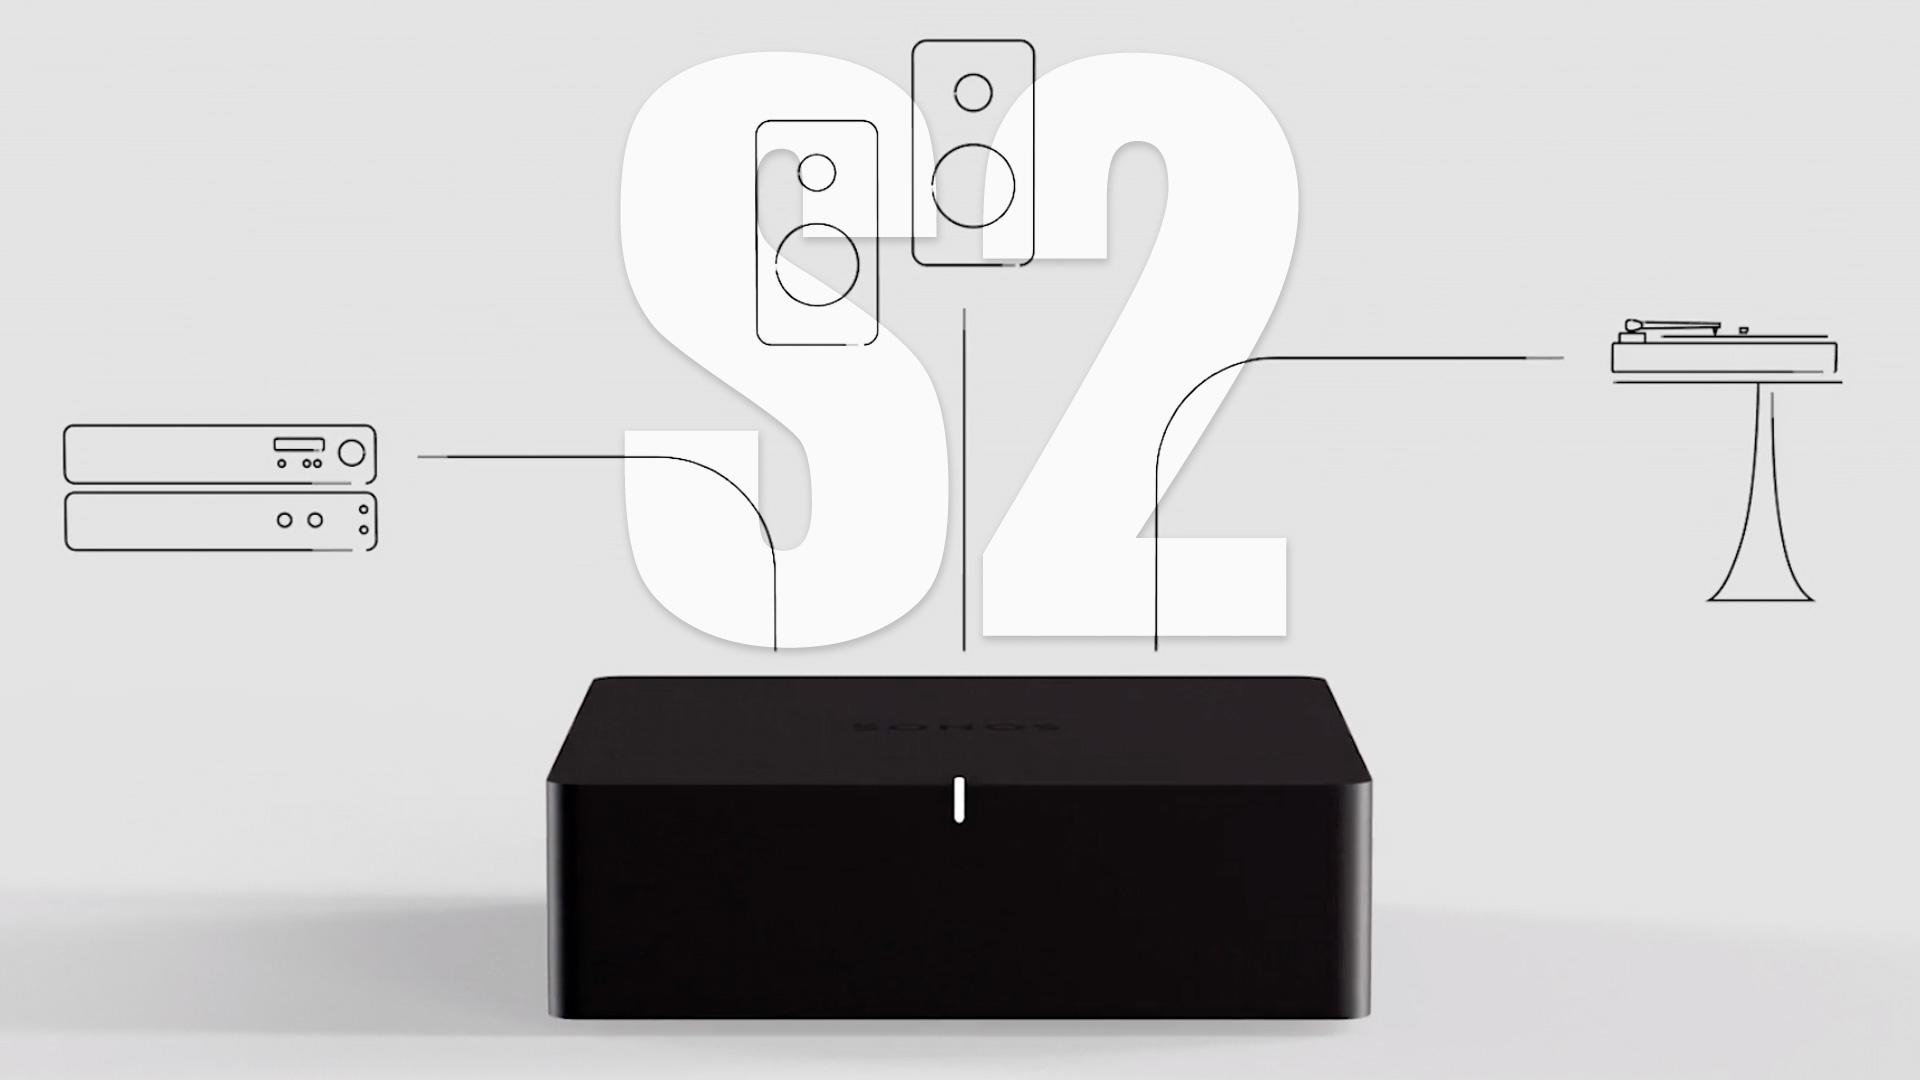 Sonos S2 Operating System | Unilet Sound & Vision